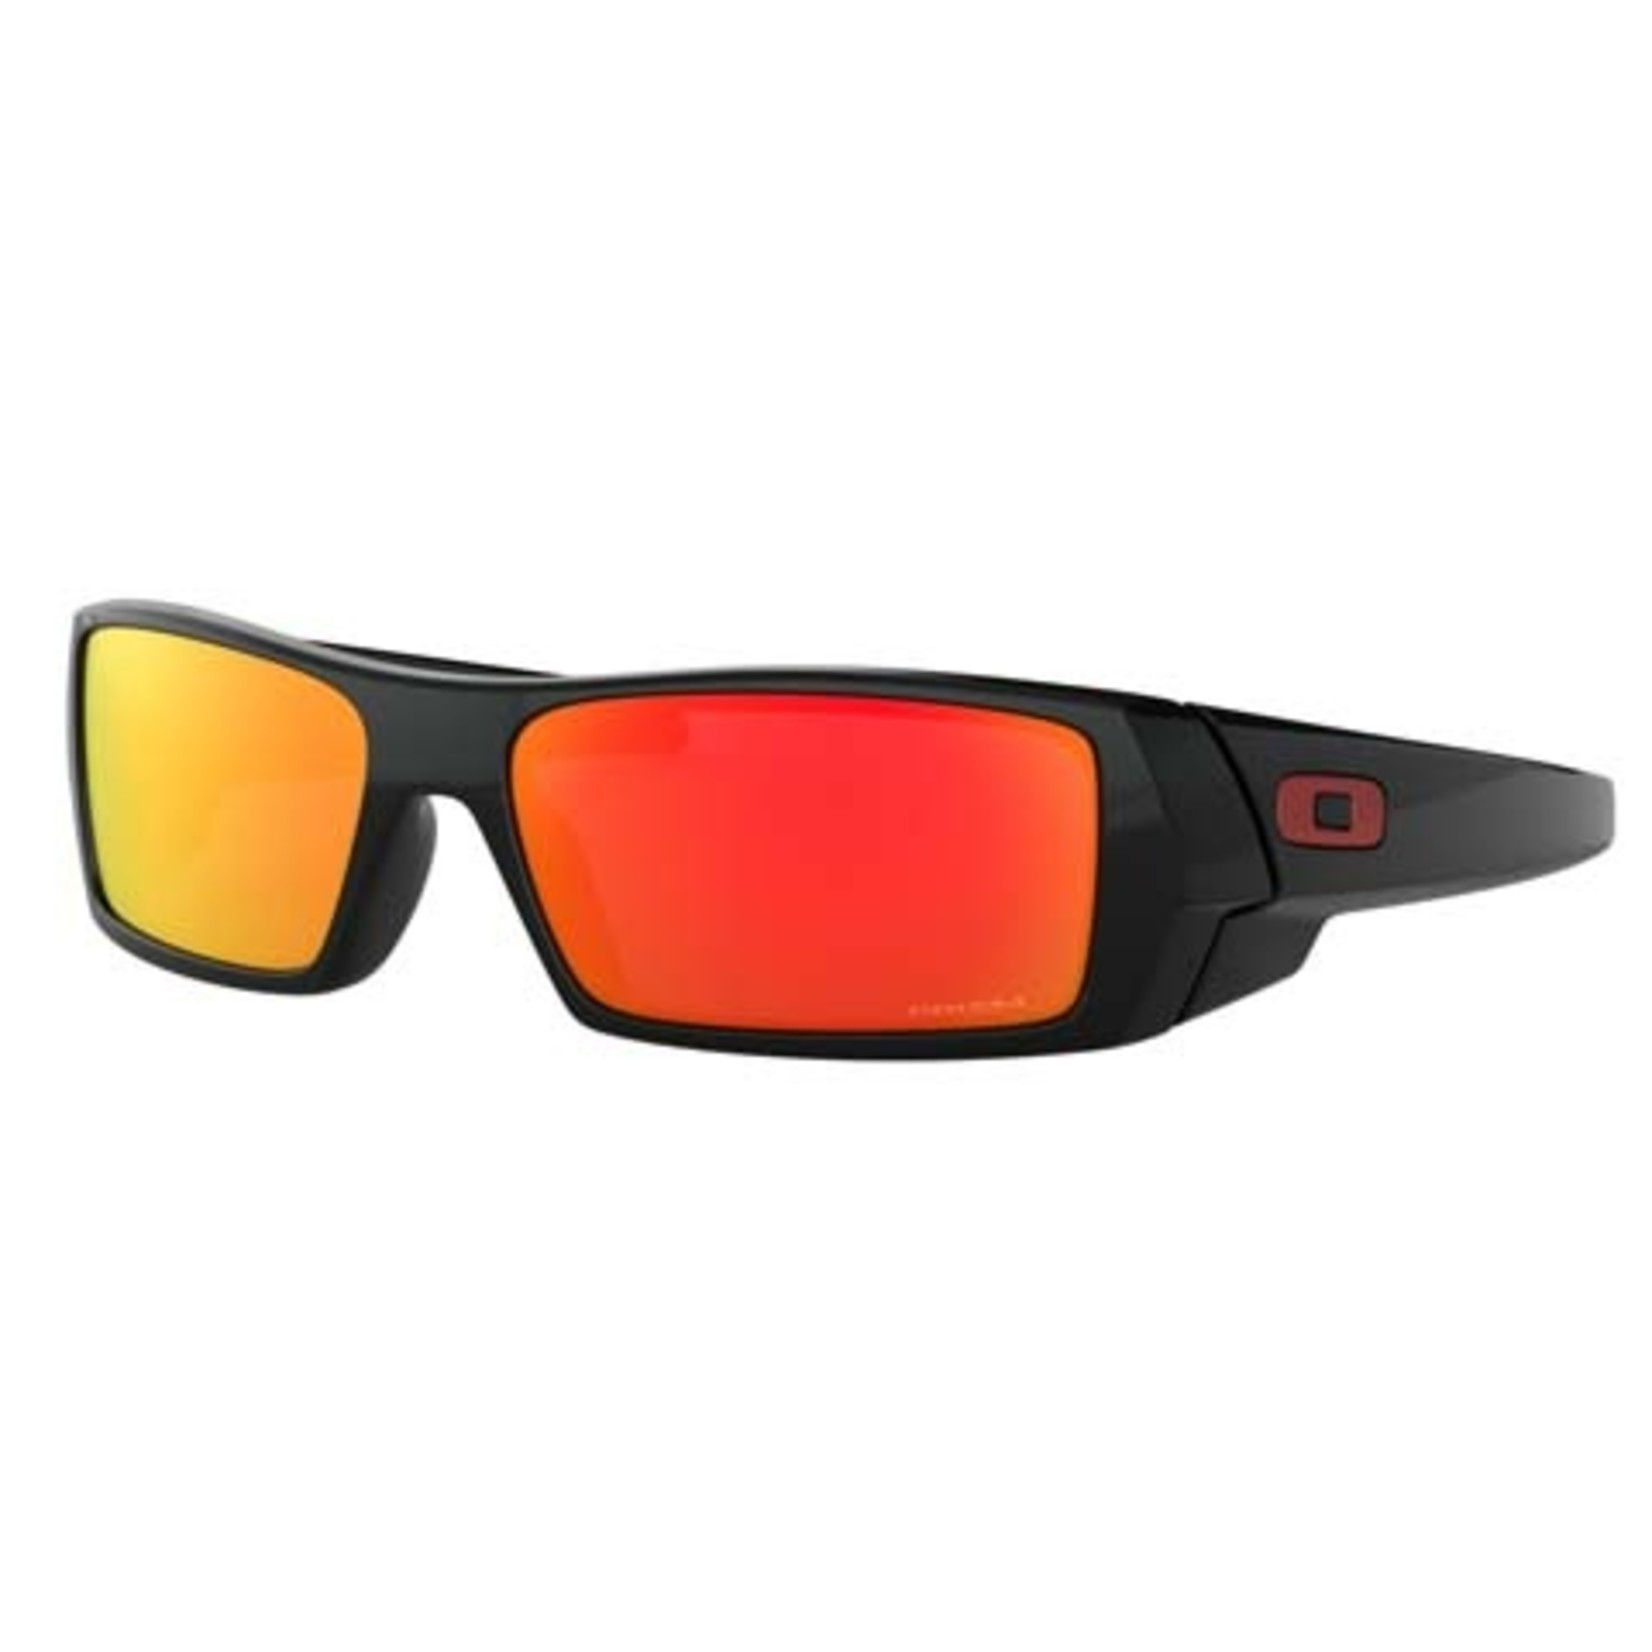 Oakley Oakley Sunglasses, Gascan, Polished Blk, Prizm Ruby